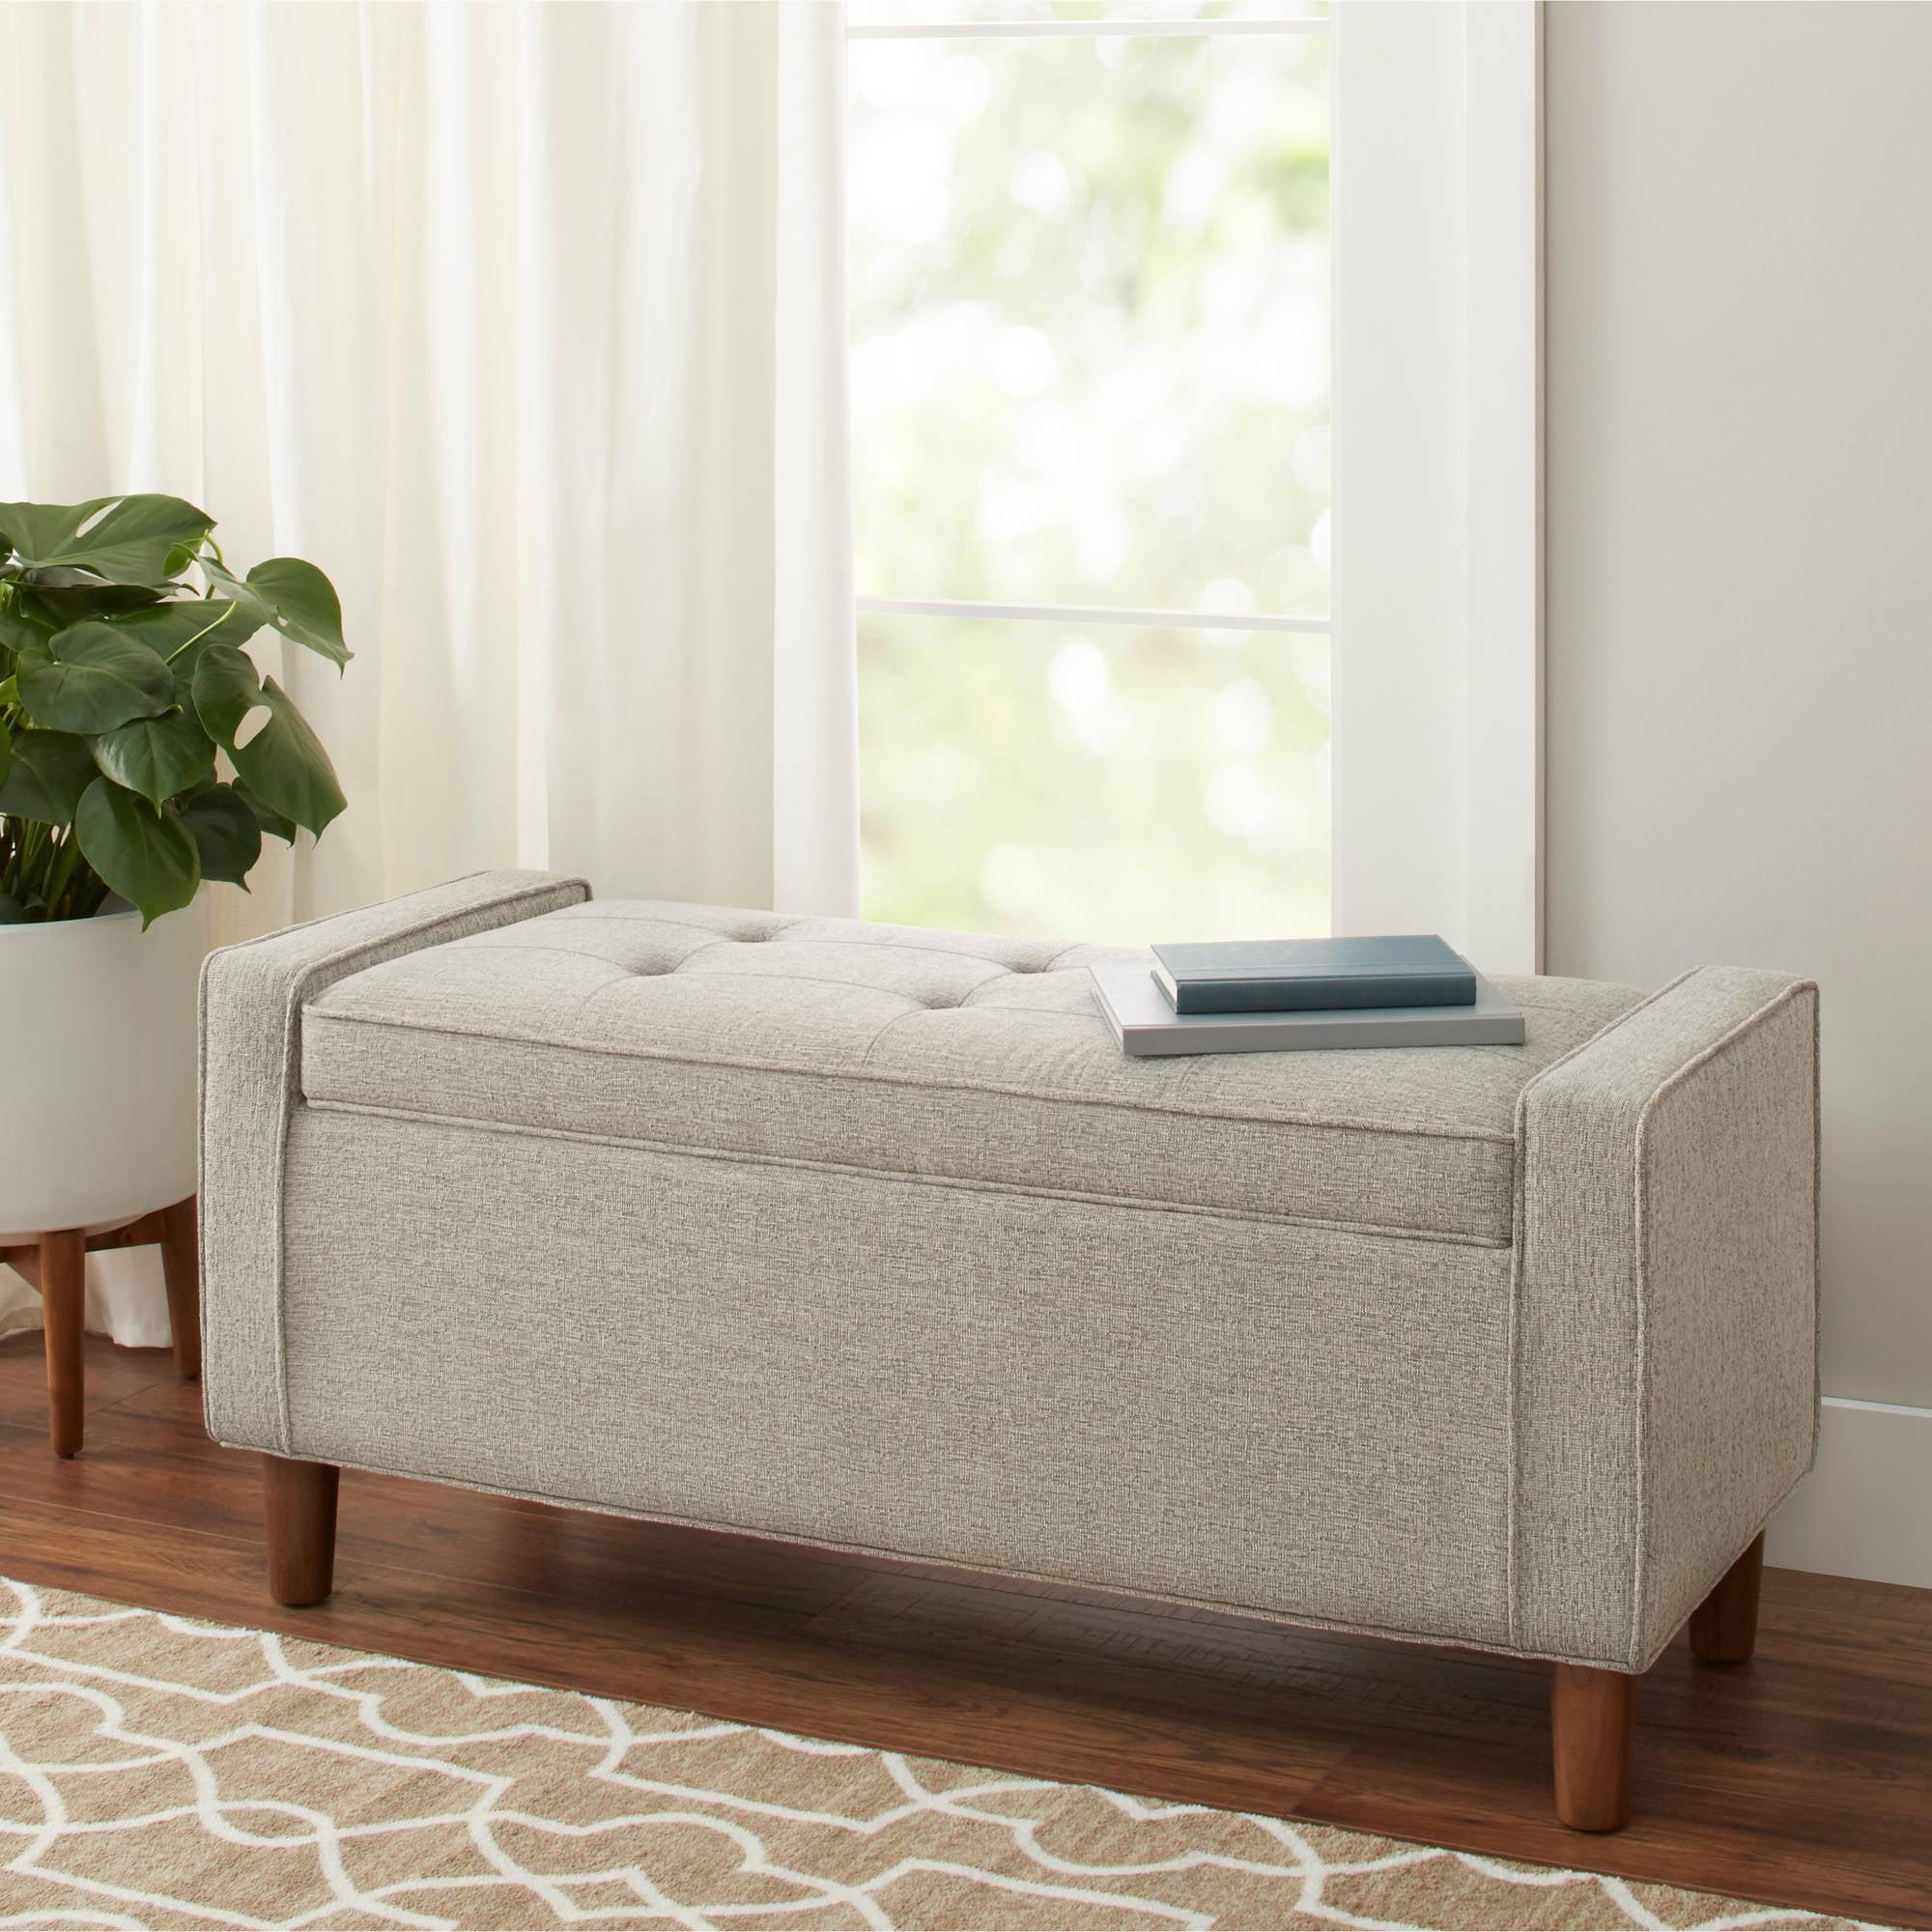 Better homes and gardens flynn mid century modern upholstered storage bench multiple colors walmart com